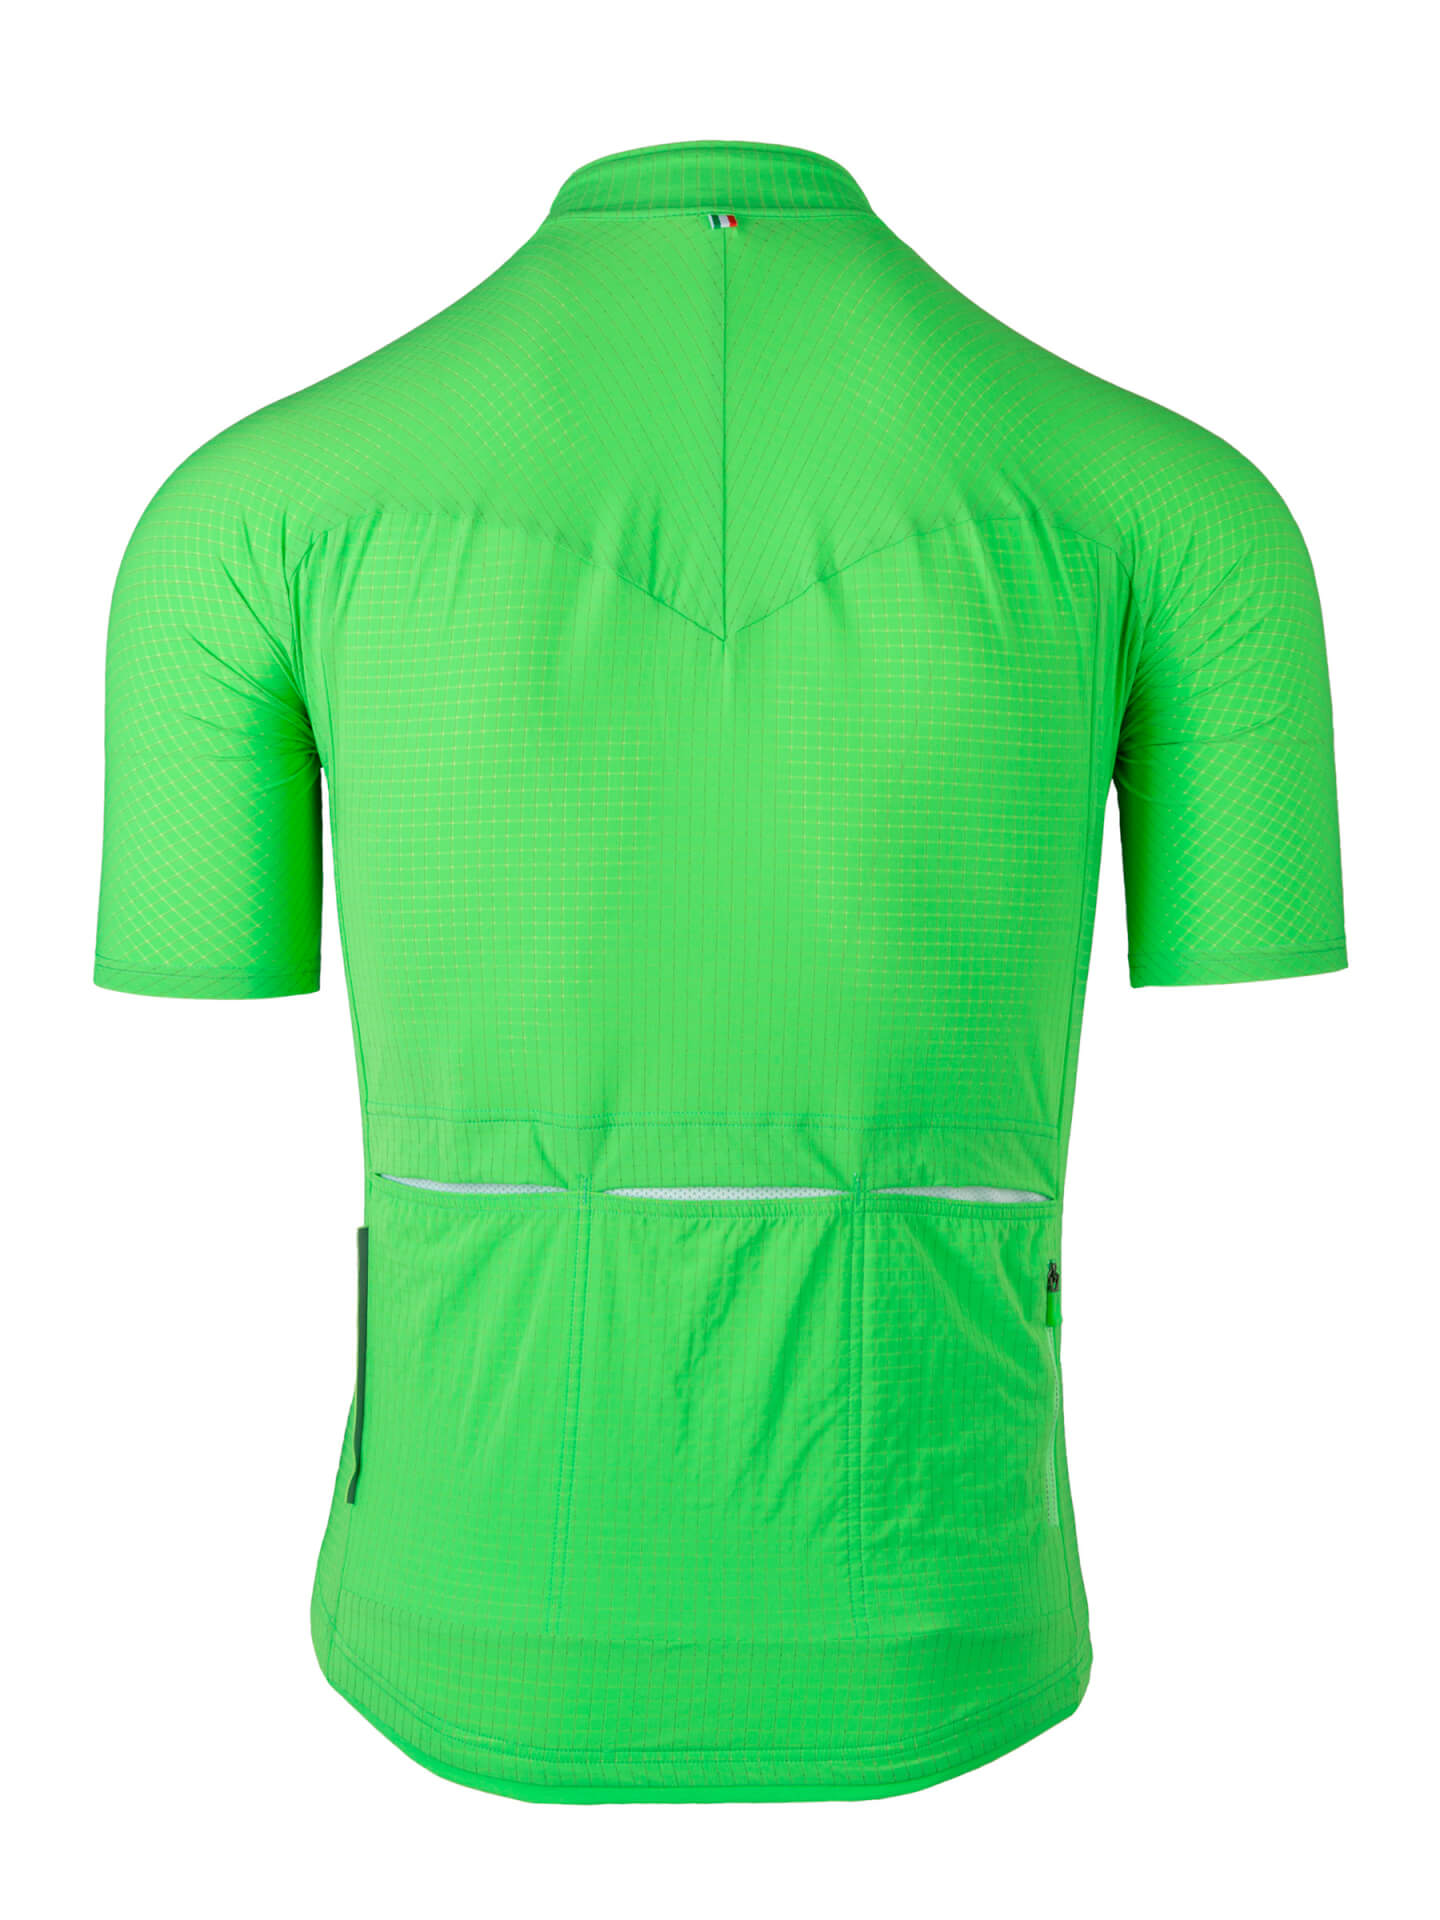 Maillot Jersey short sleeve L1 Pinstripe Verde